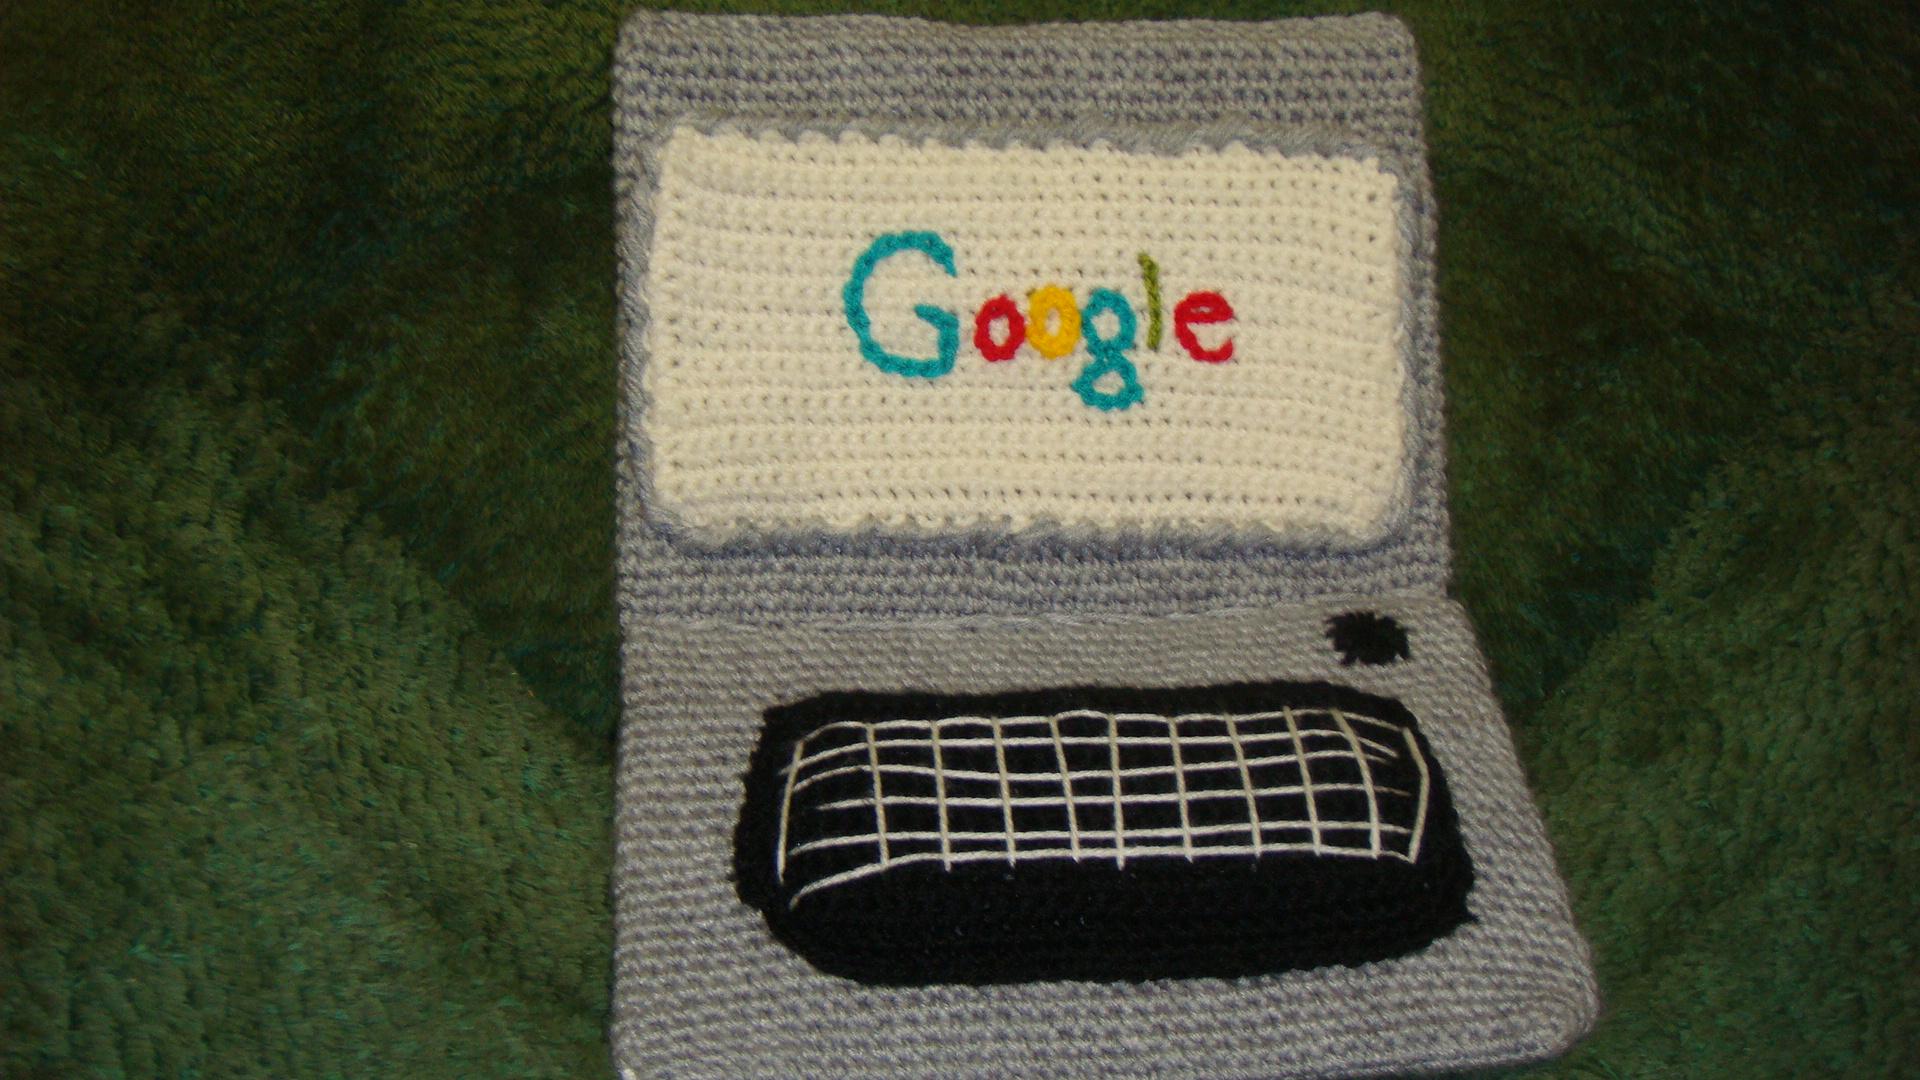 Google (Le Petit Bateau @ Daisy Market)